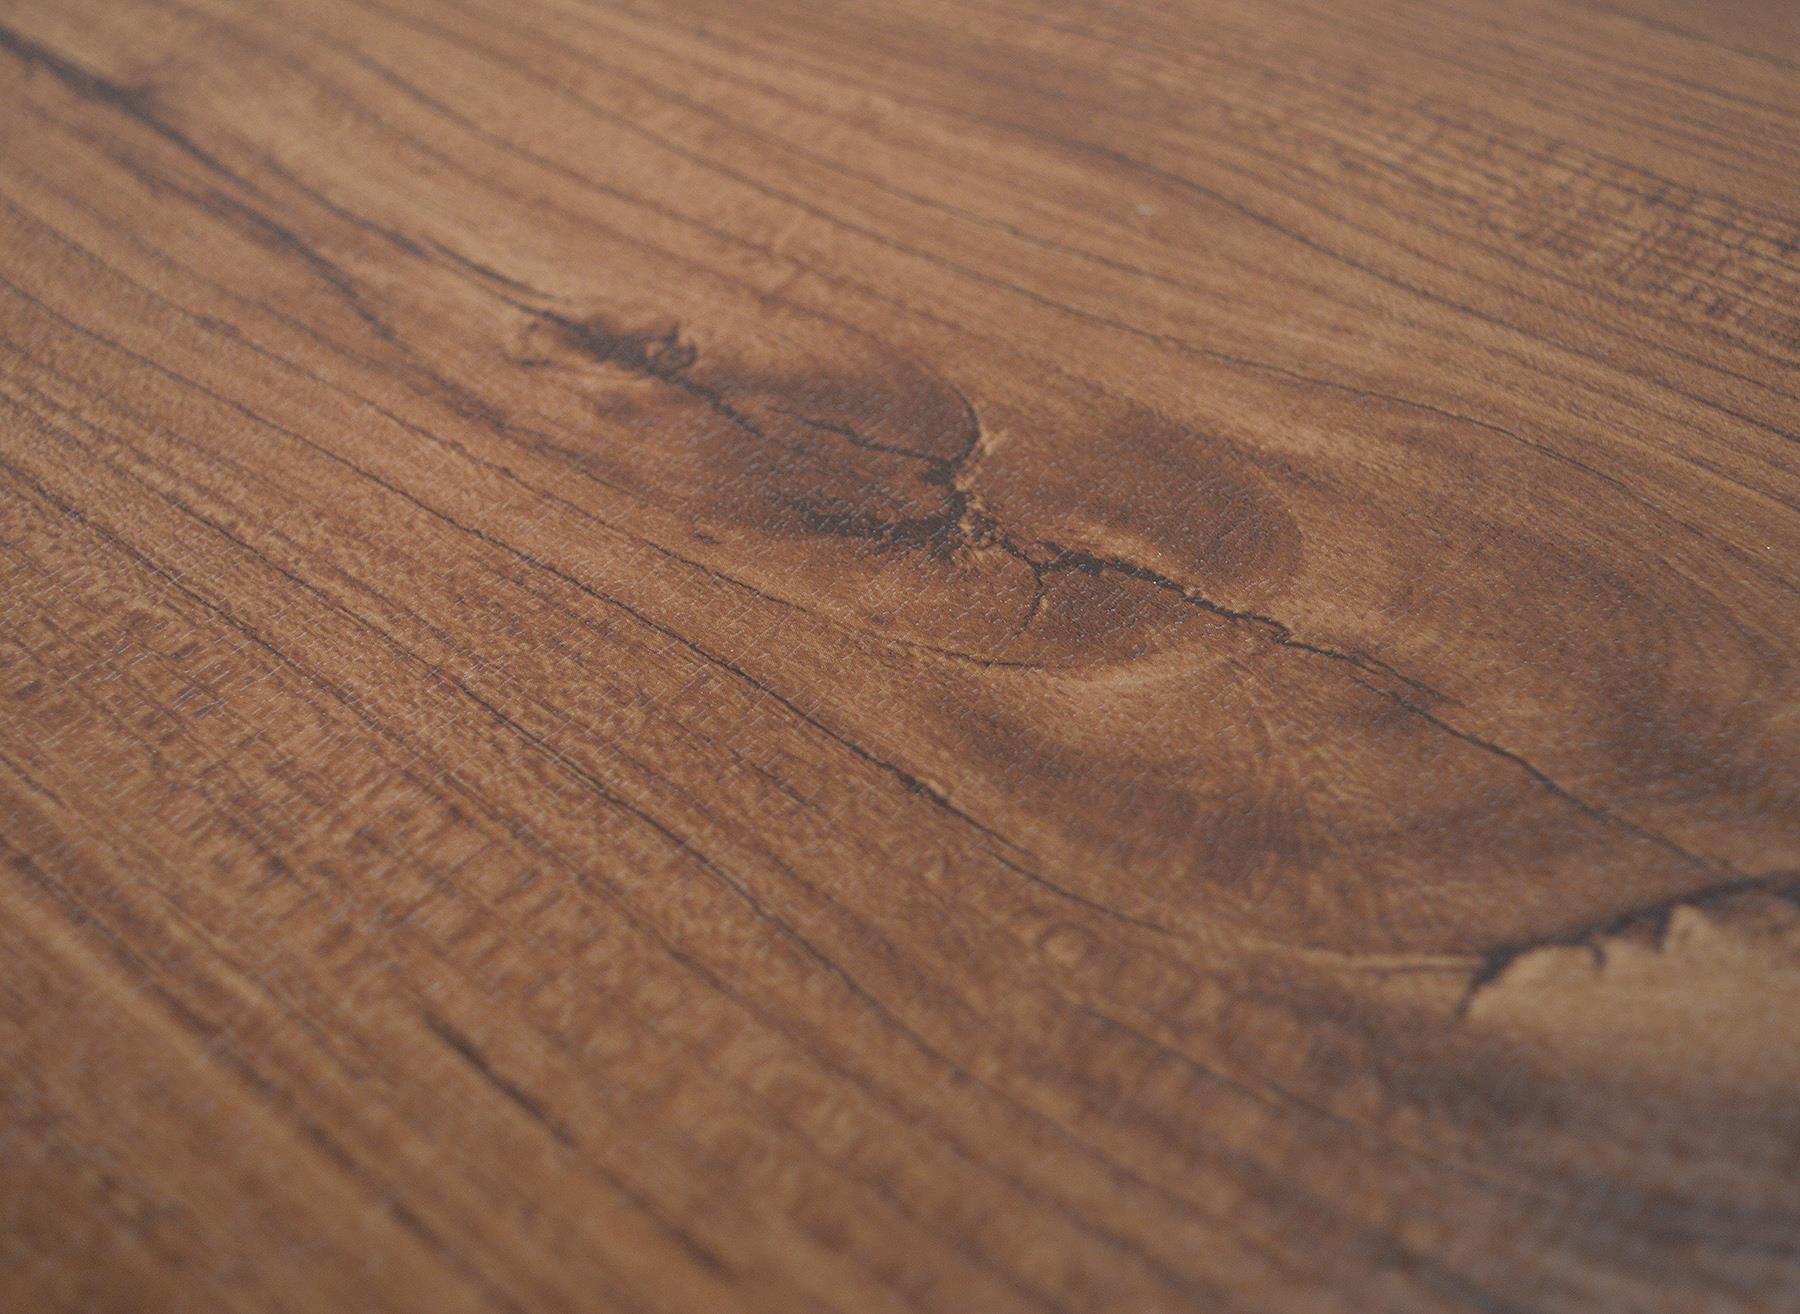 Floor-Tiles-Self-Adhesive-Vinyl-Flooring-Kitchen-Bathroom-Brown-Wood-Grain thumbnail 28